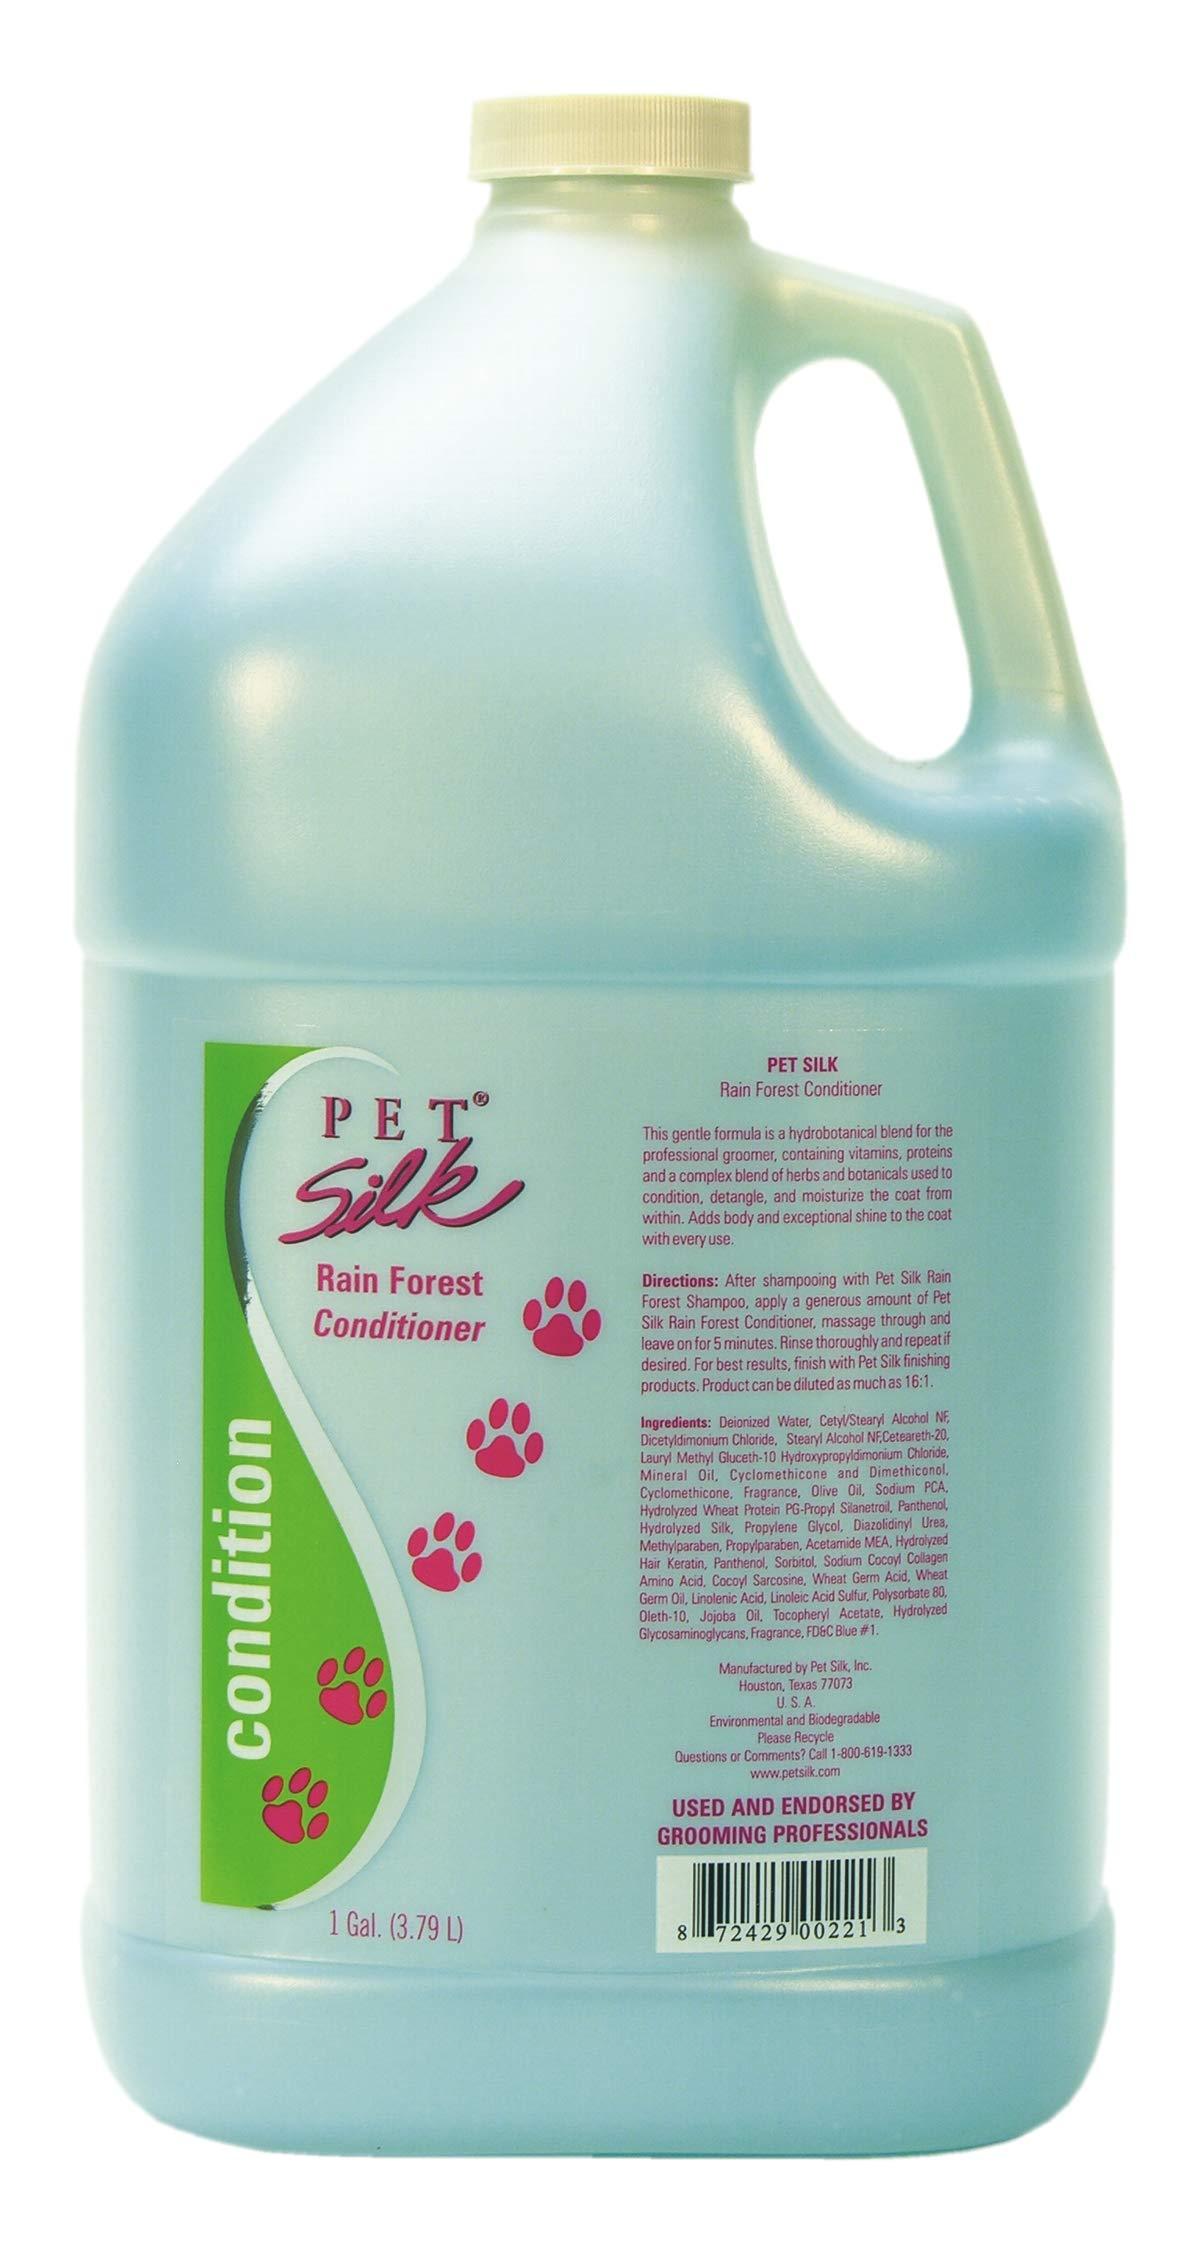 Pet Silk Pet Silk Rainforest Conditioner 128 Oz, 16 Oz